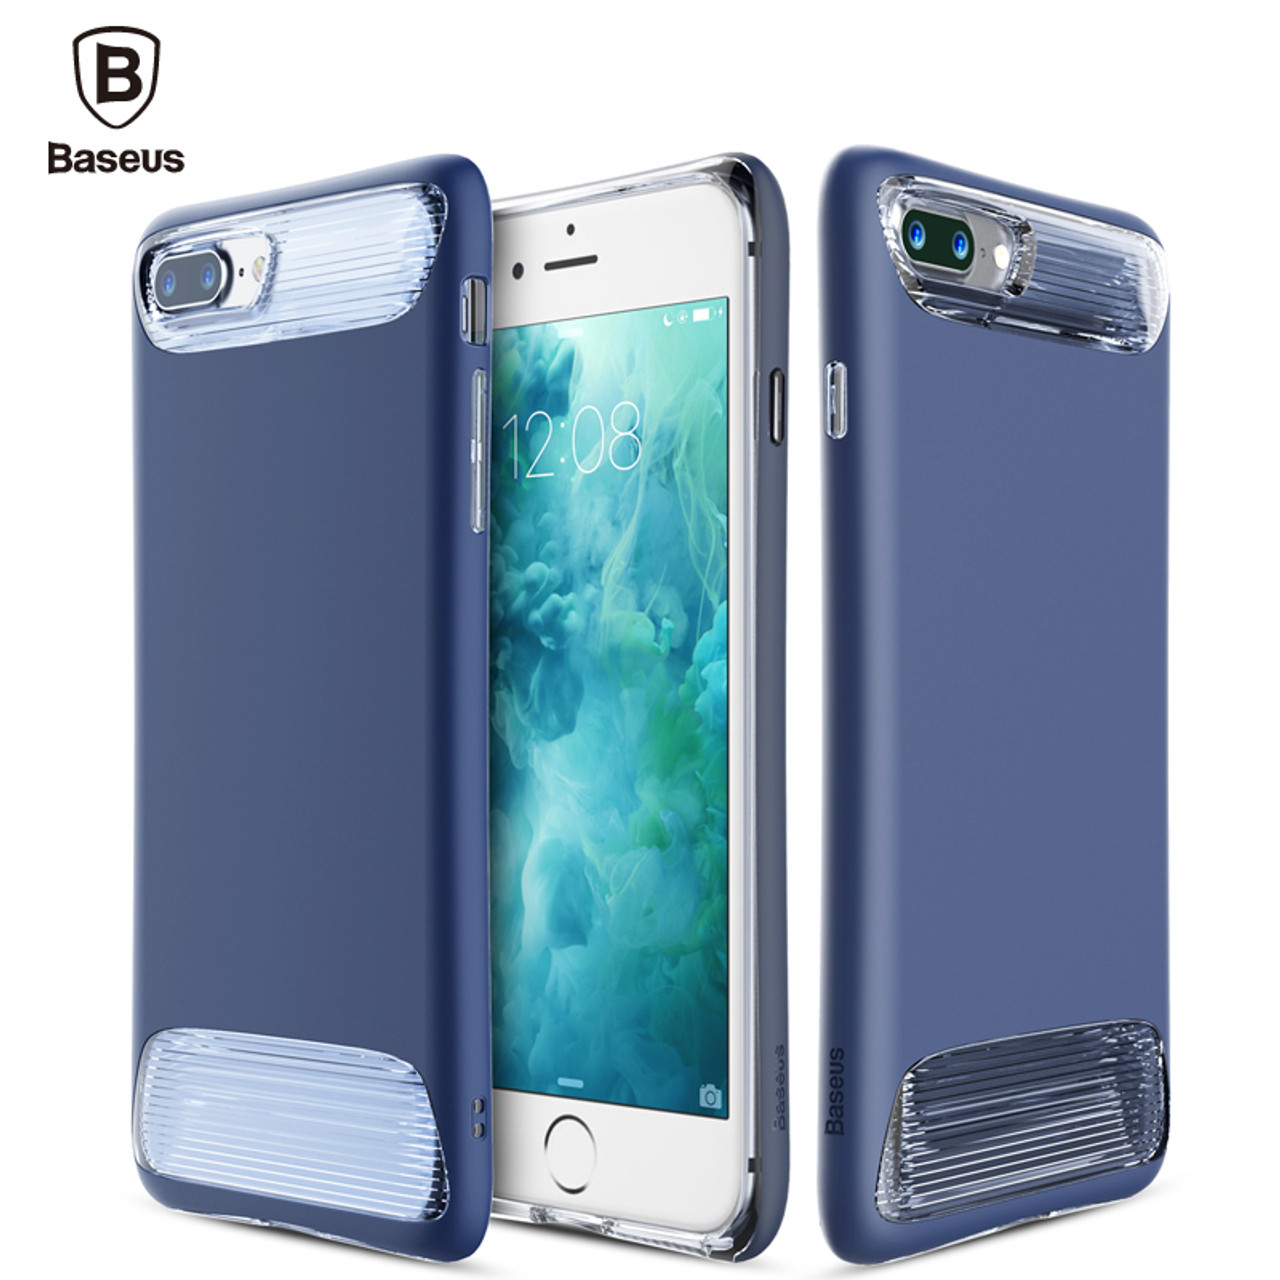 coque iphone 8 baseus